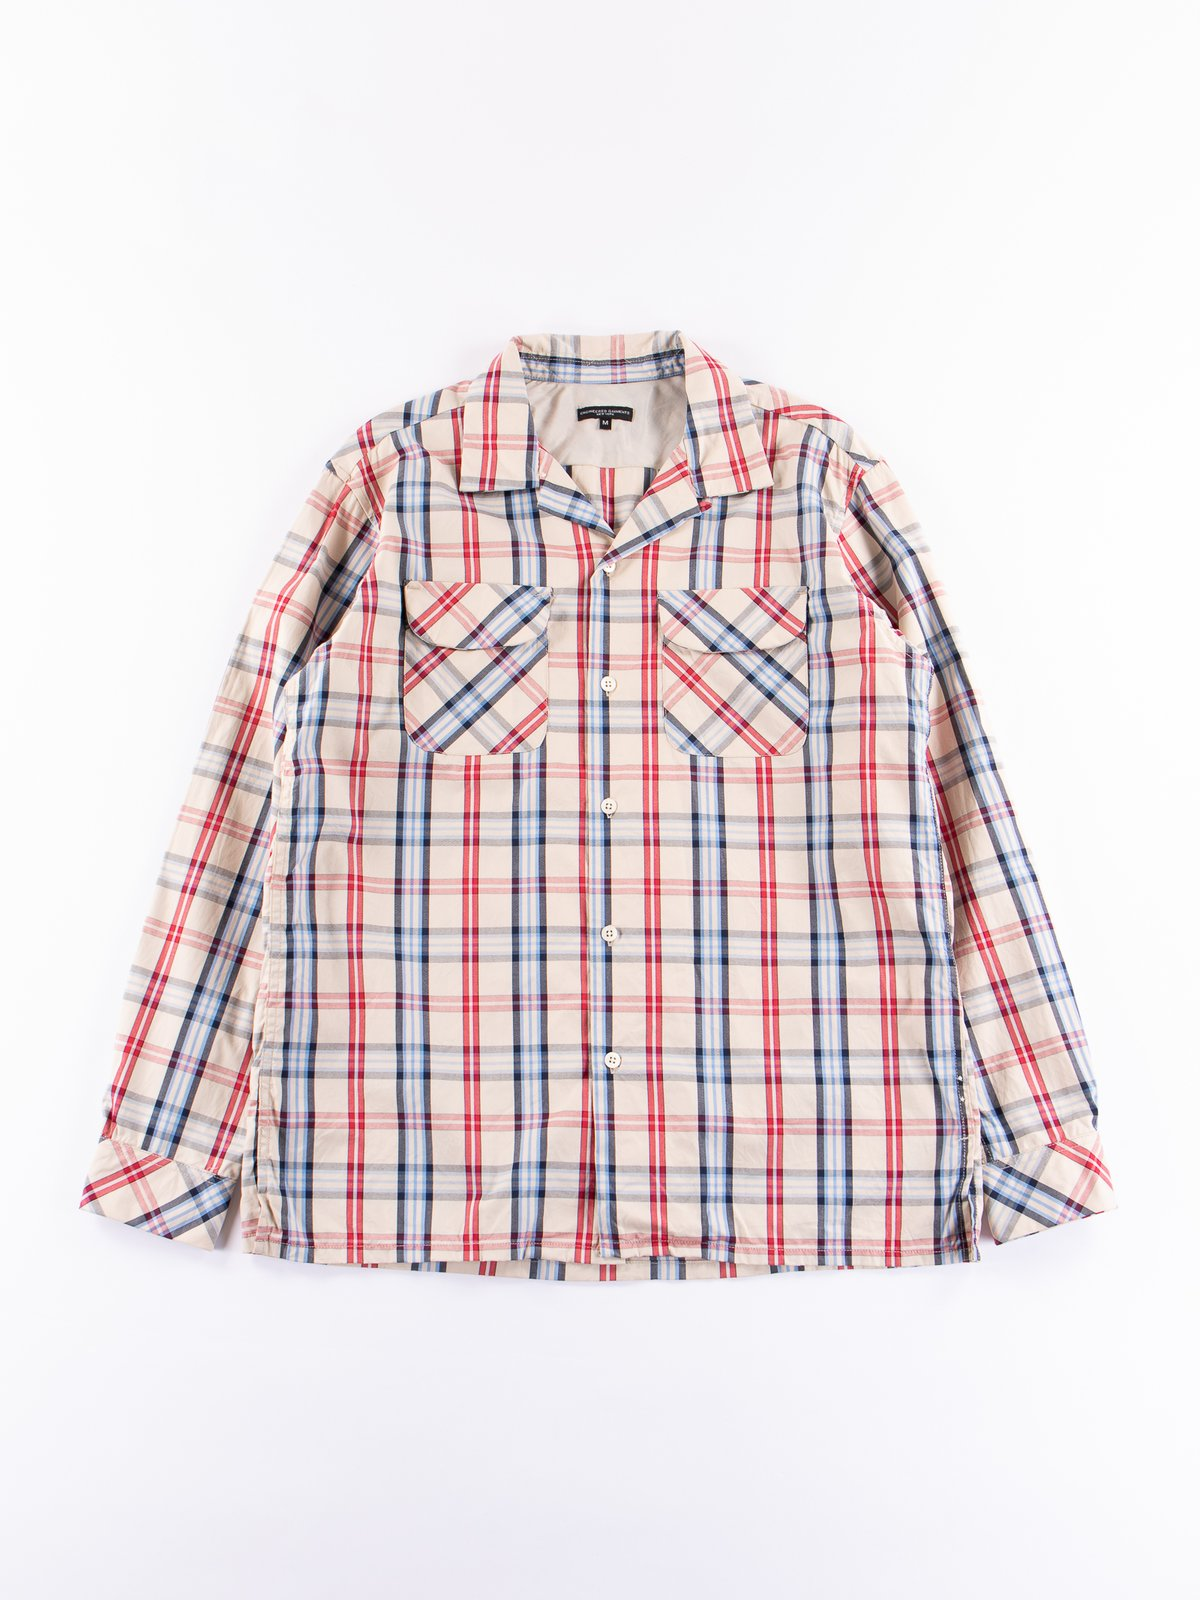 Khaki/Red/Blue Plaid Classic Shirt - Image 1